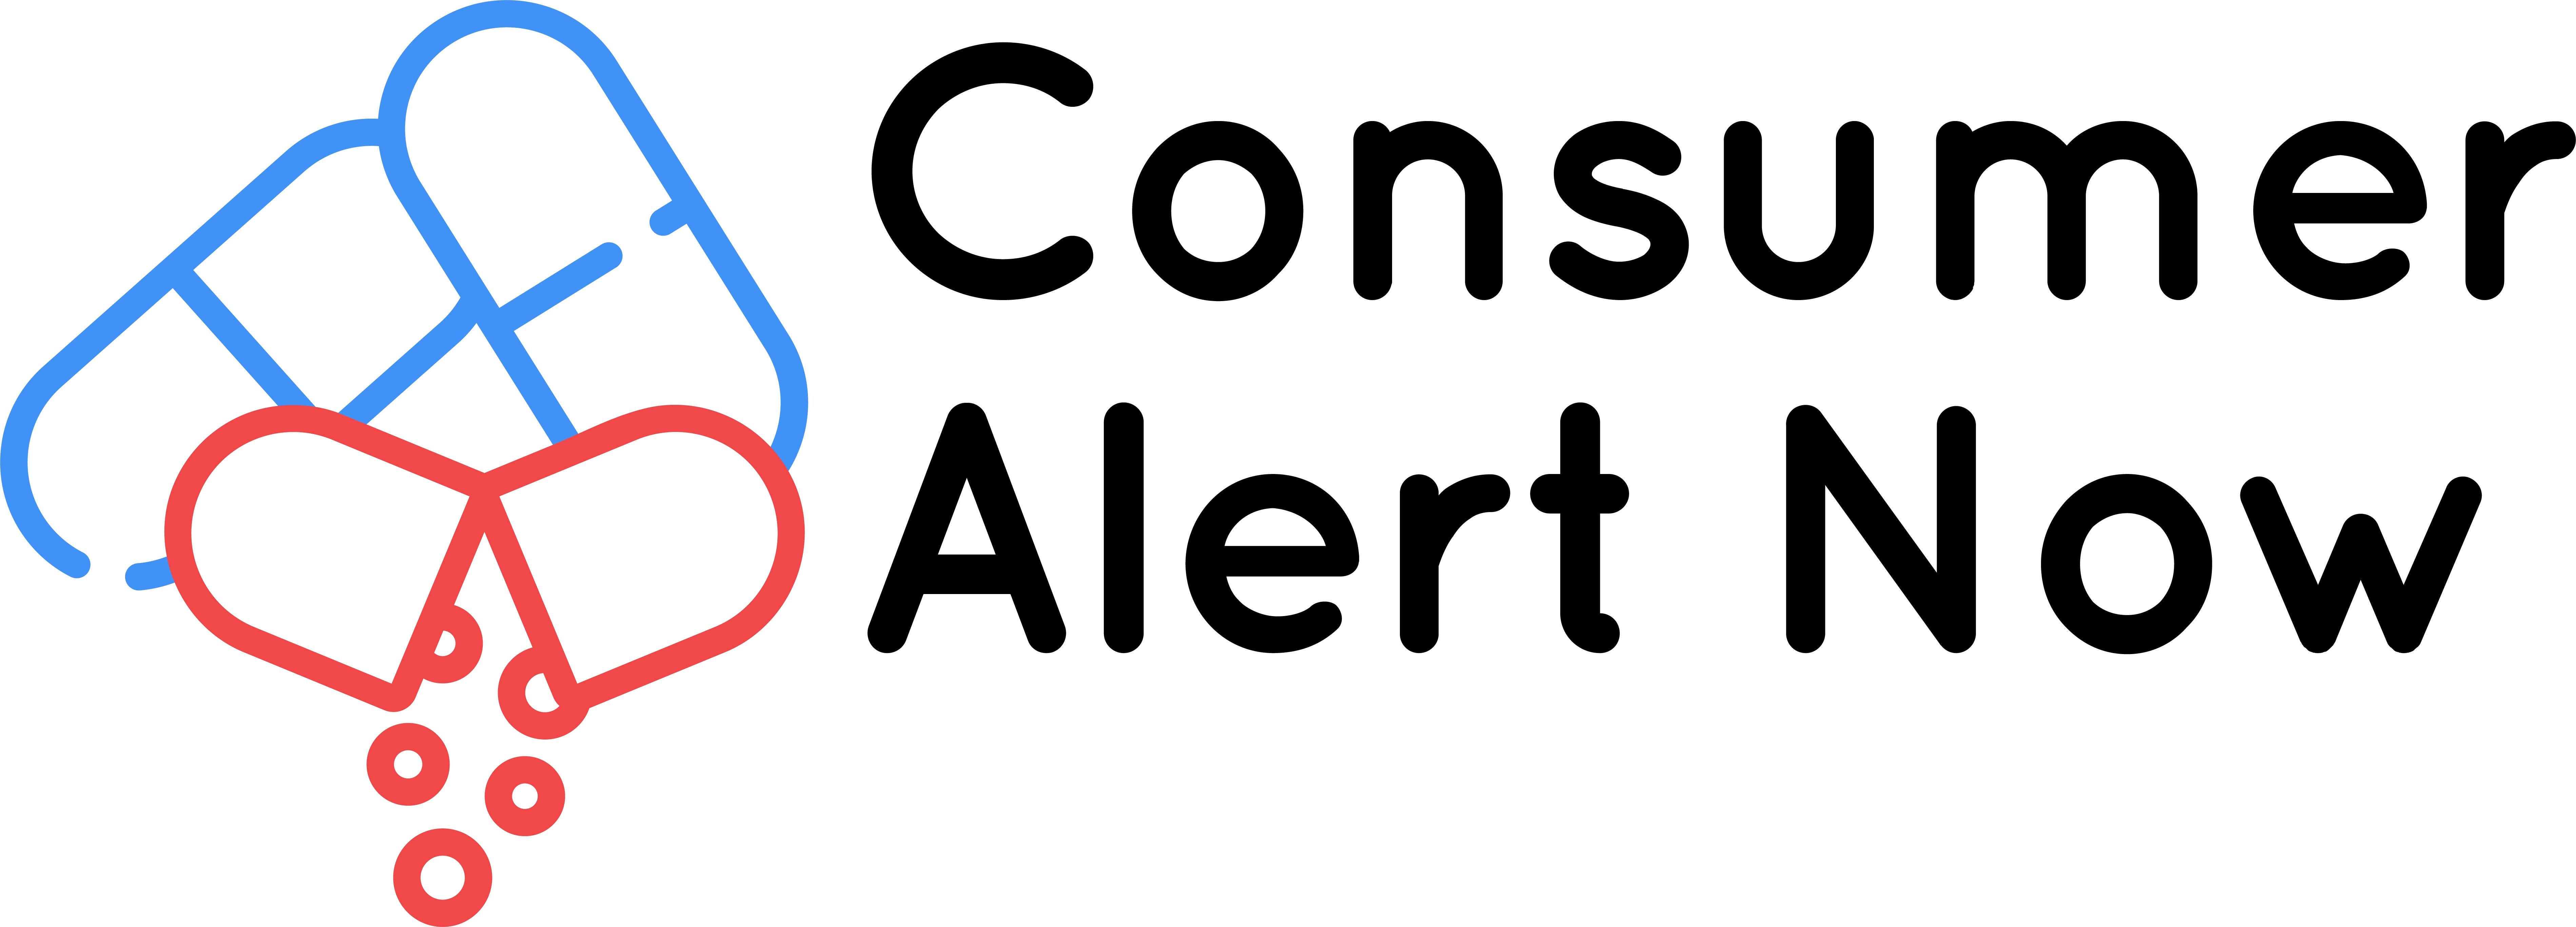 Consumer Alert Now